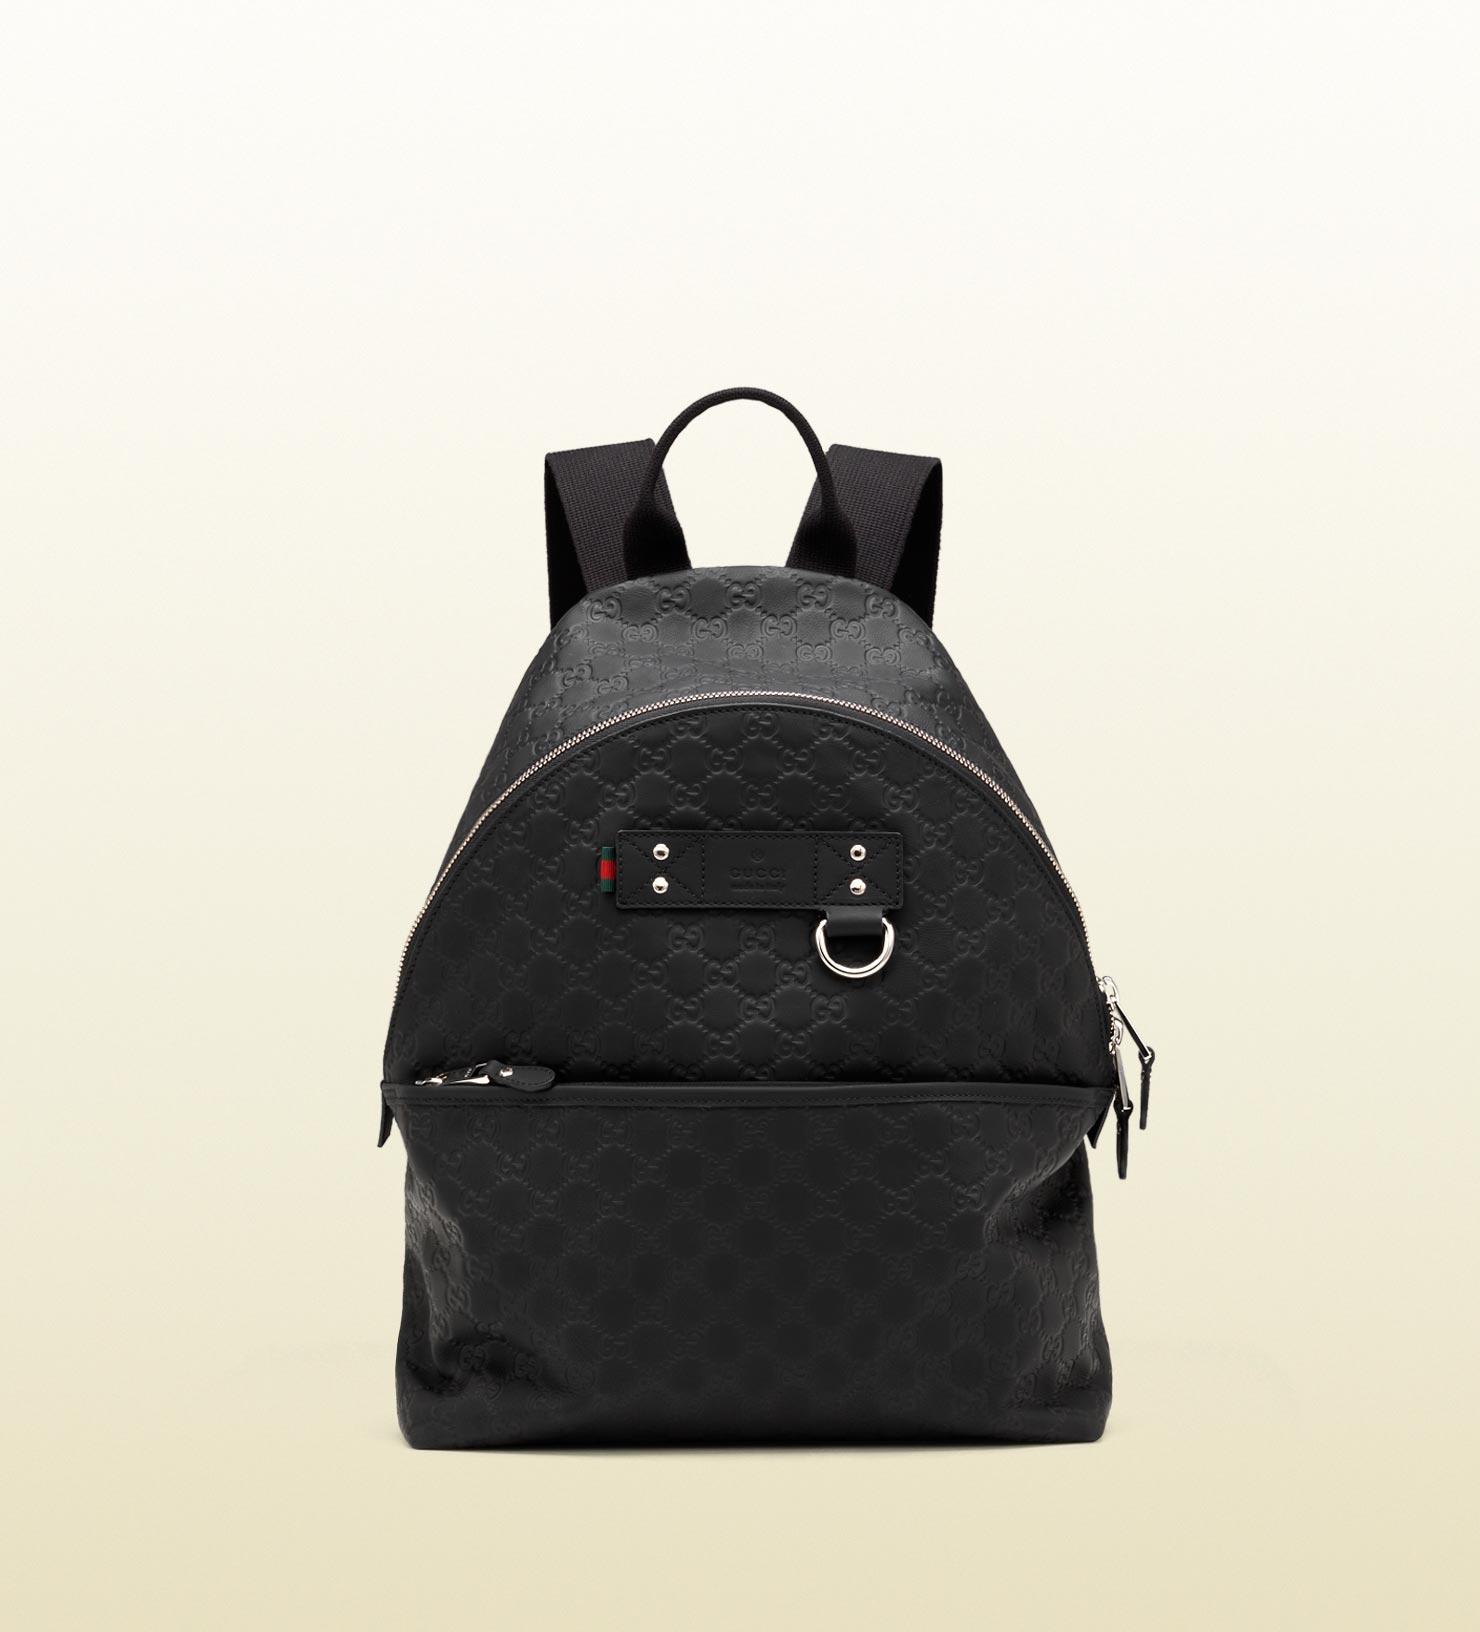 Gucci backpack in black for men lyst